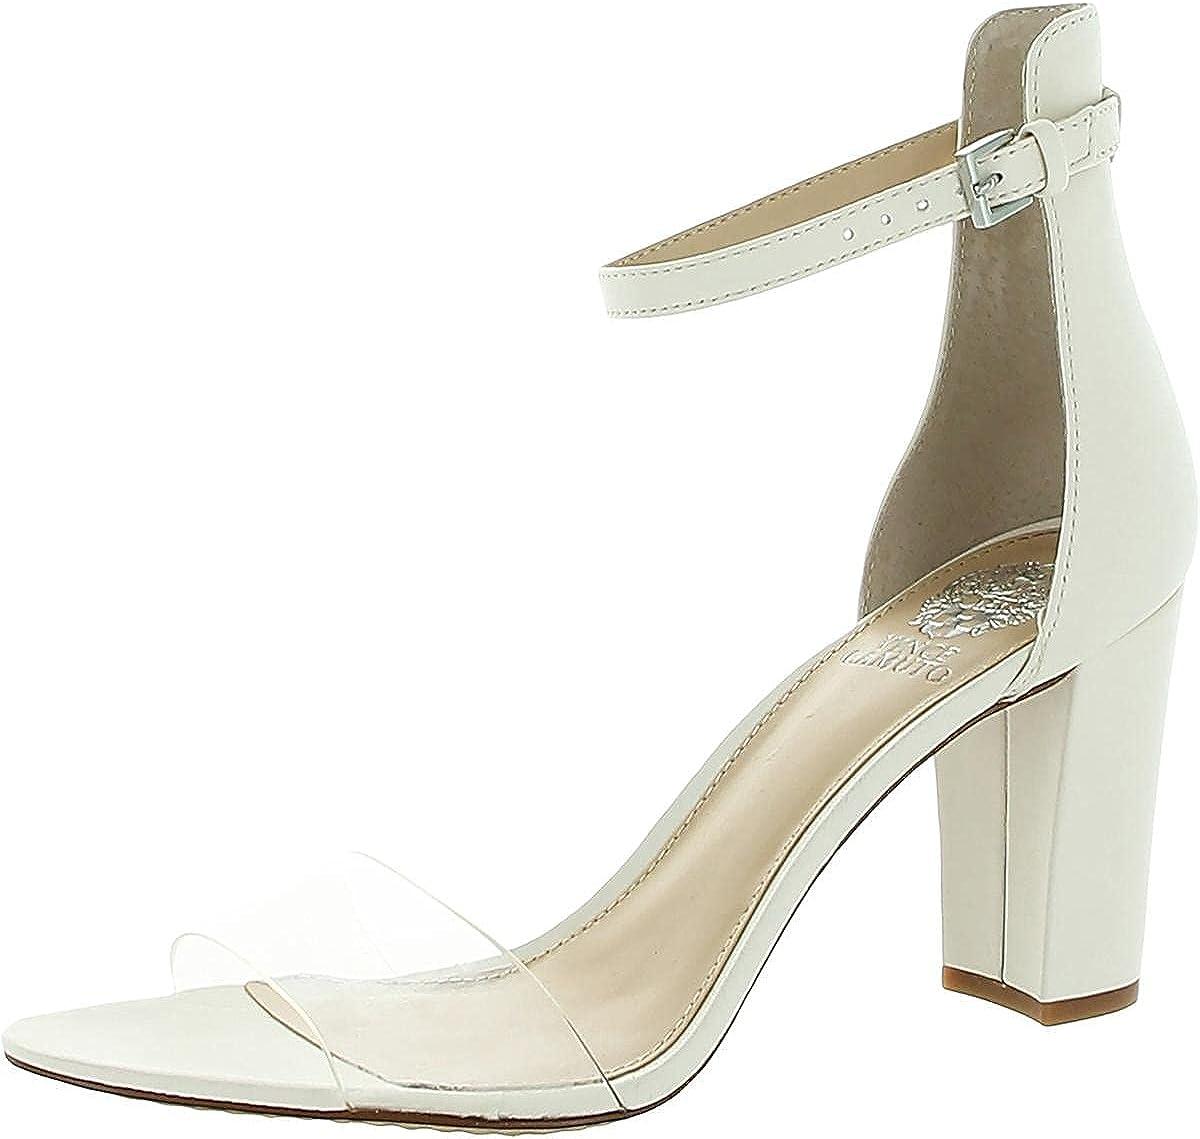 Vince Camuto Womens Corlina Leather Heel Sandals Ivory 5.5 Medium (B,M)